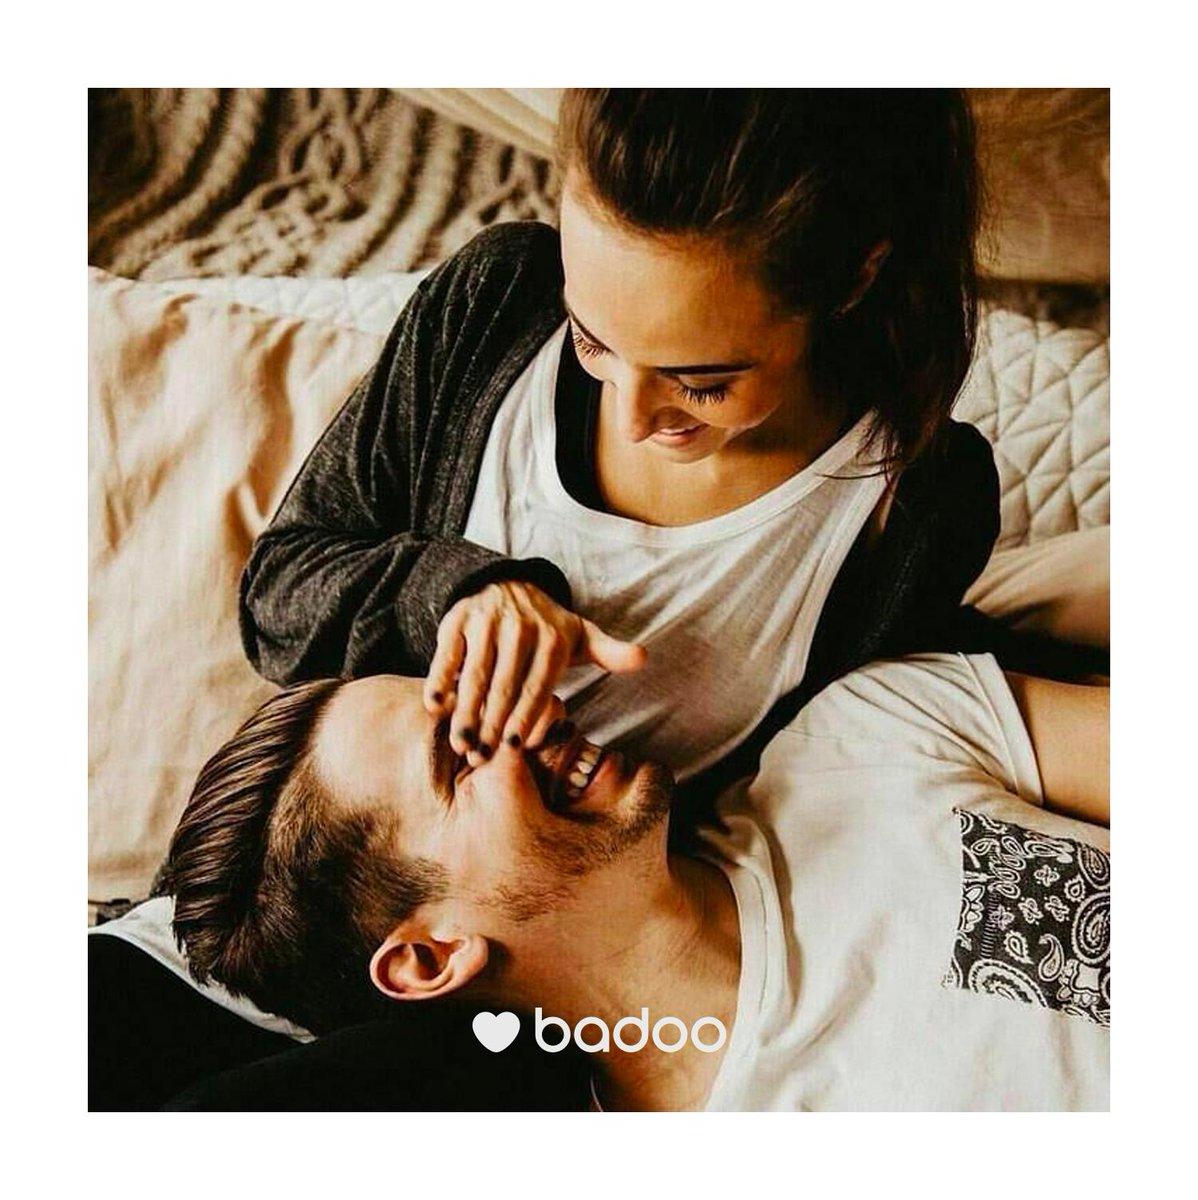 Boy dating boy live movie 2019 trailer